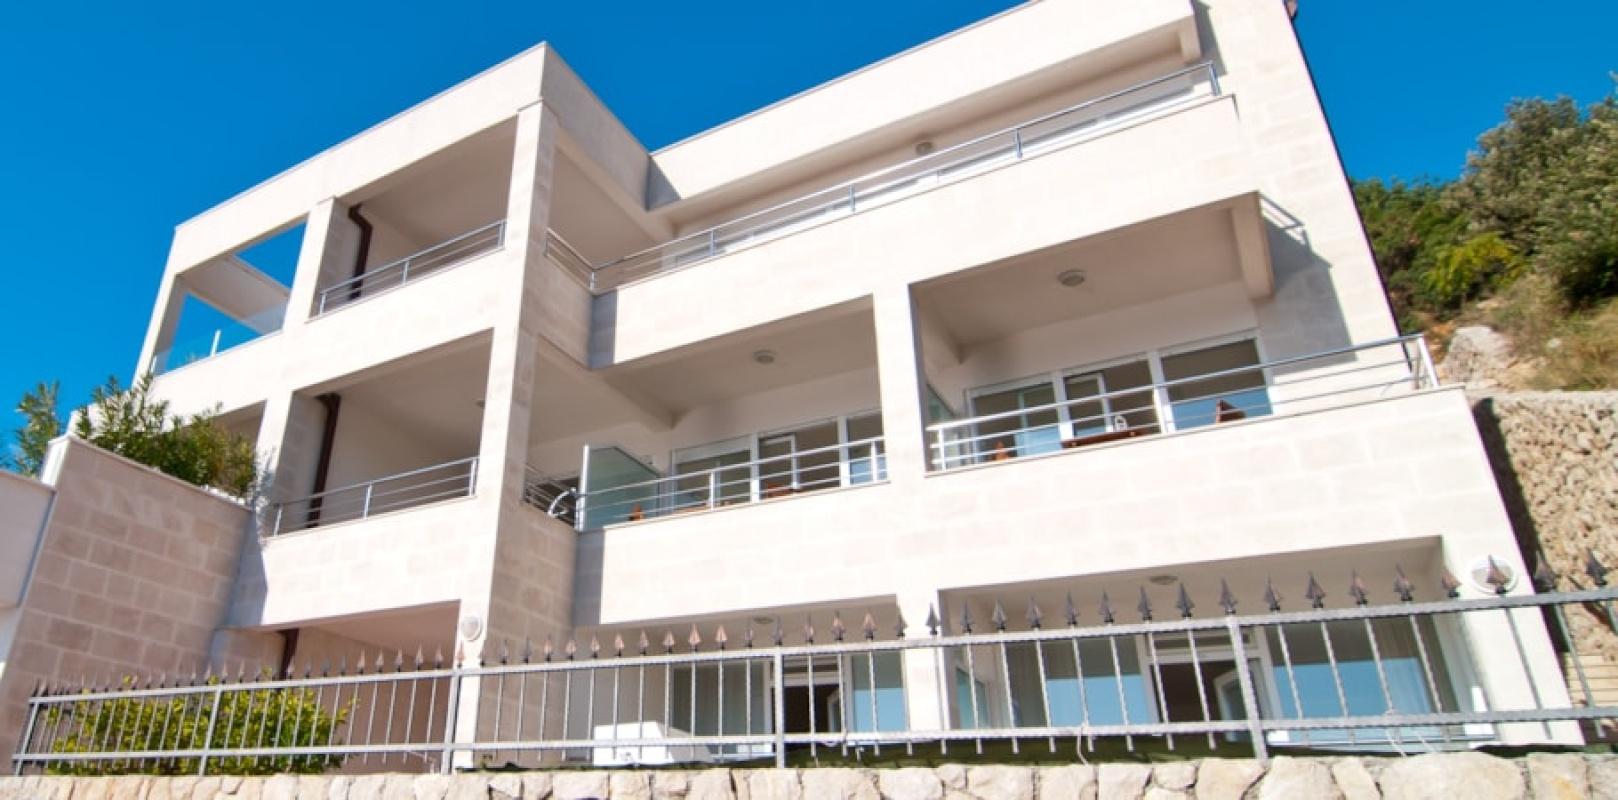 Апартаменты VILLA KATARINA II 7193, Babin kuk/Lapad, Дубровник, Регион Дубровник